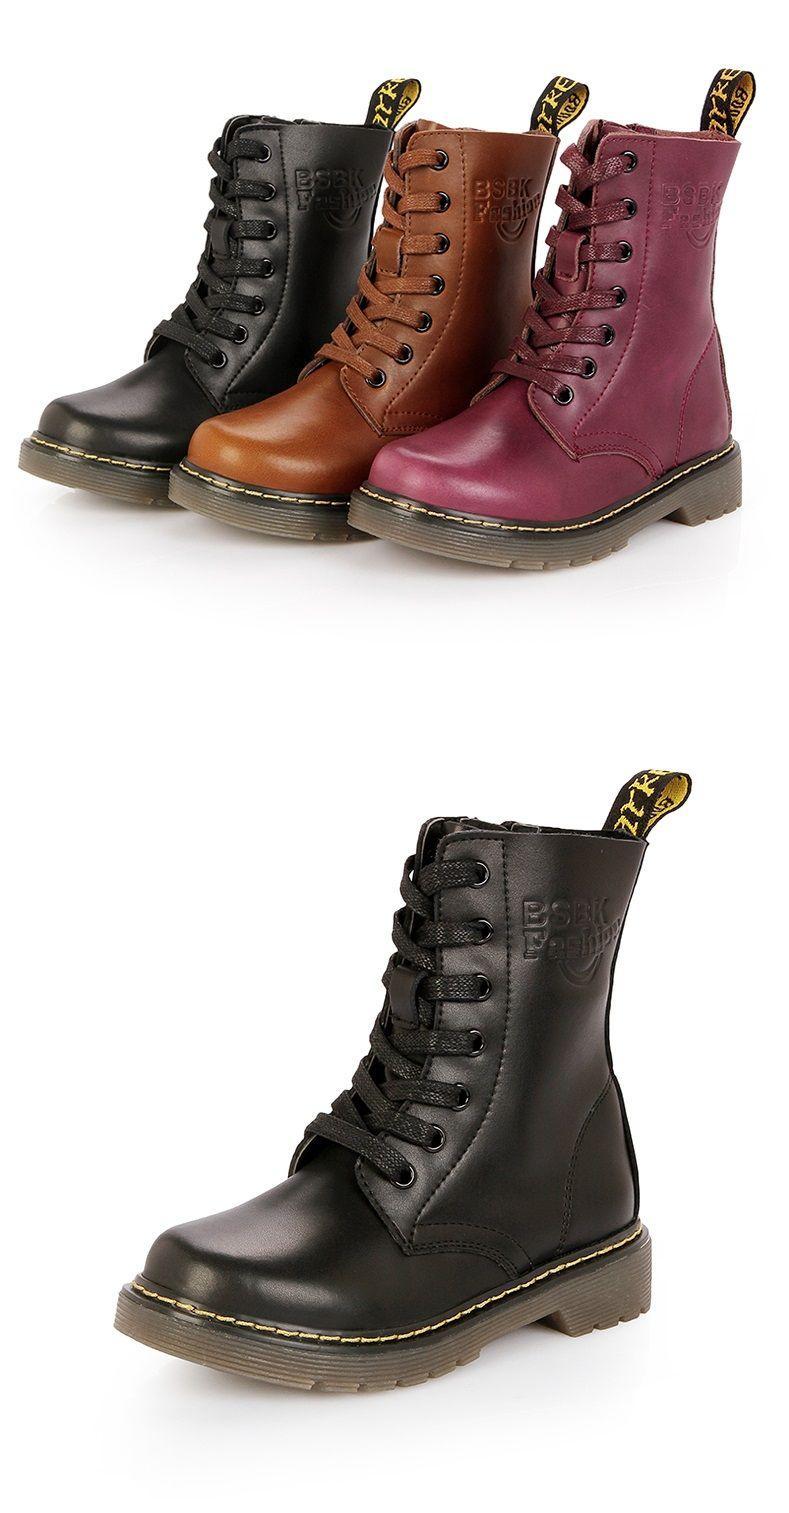 Cheap Newest China Top Brand Autumn Winter Children Boots Kids ...